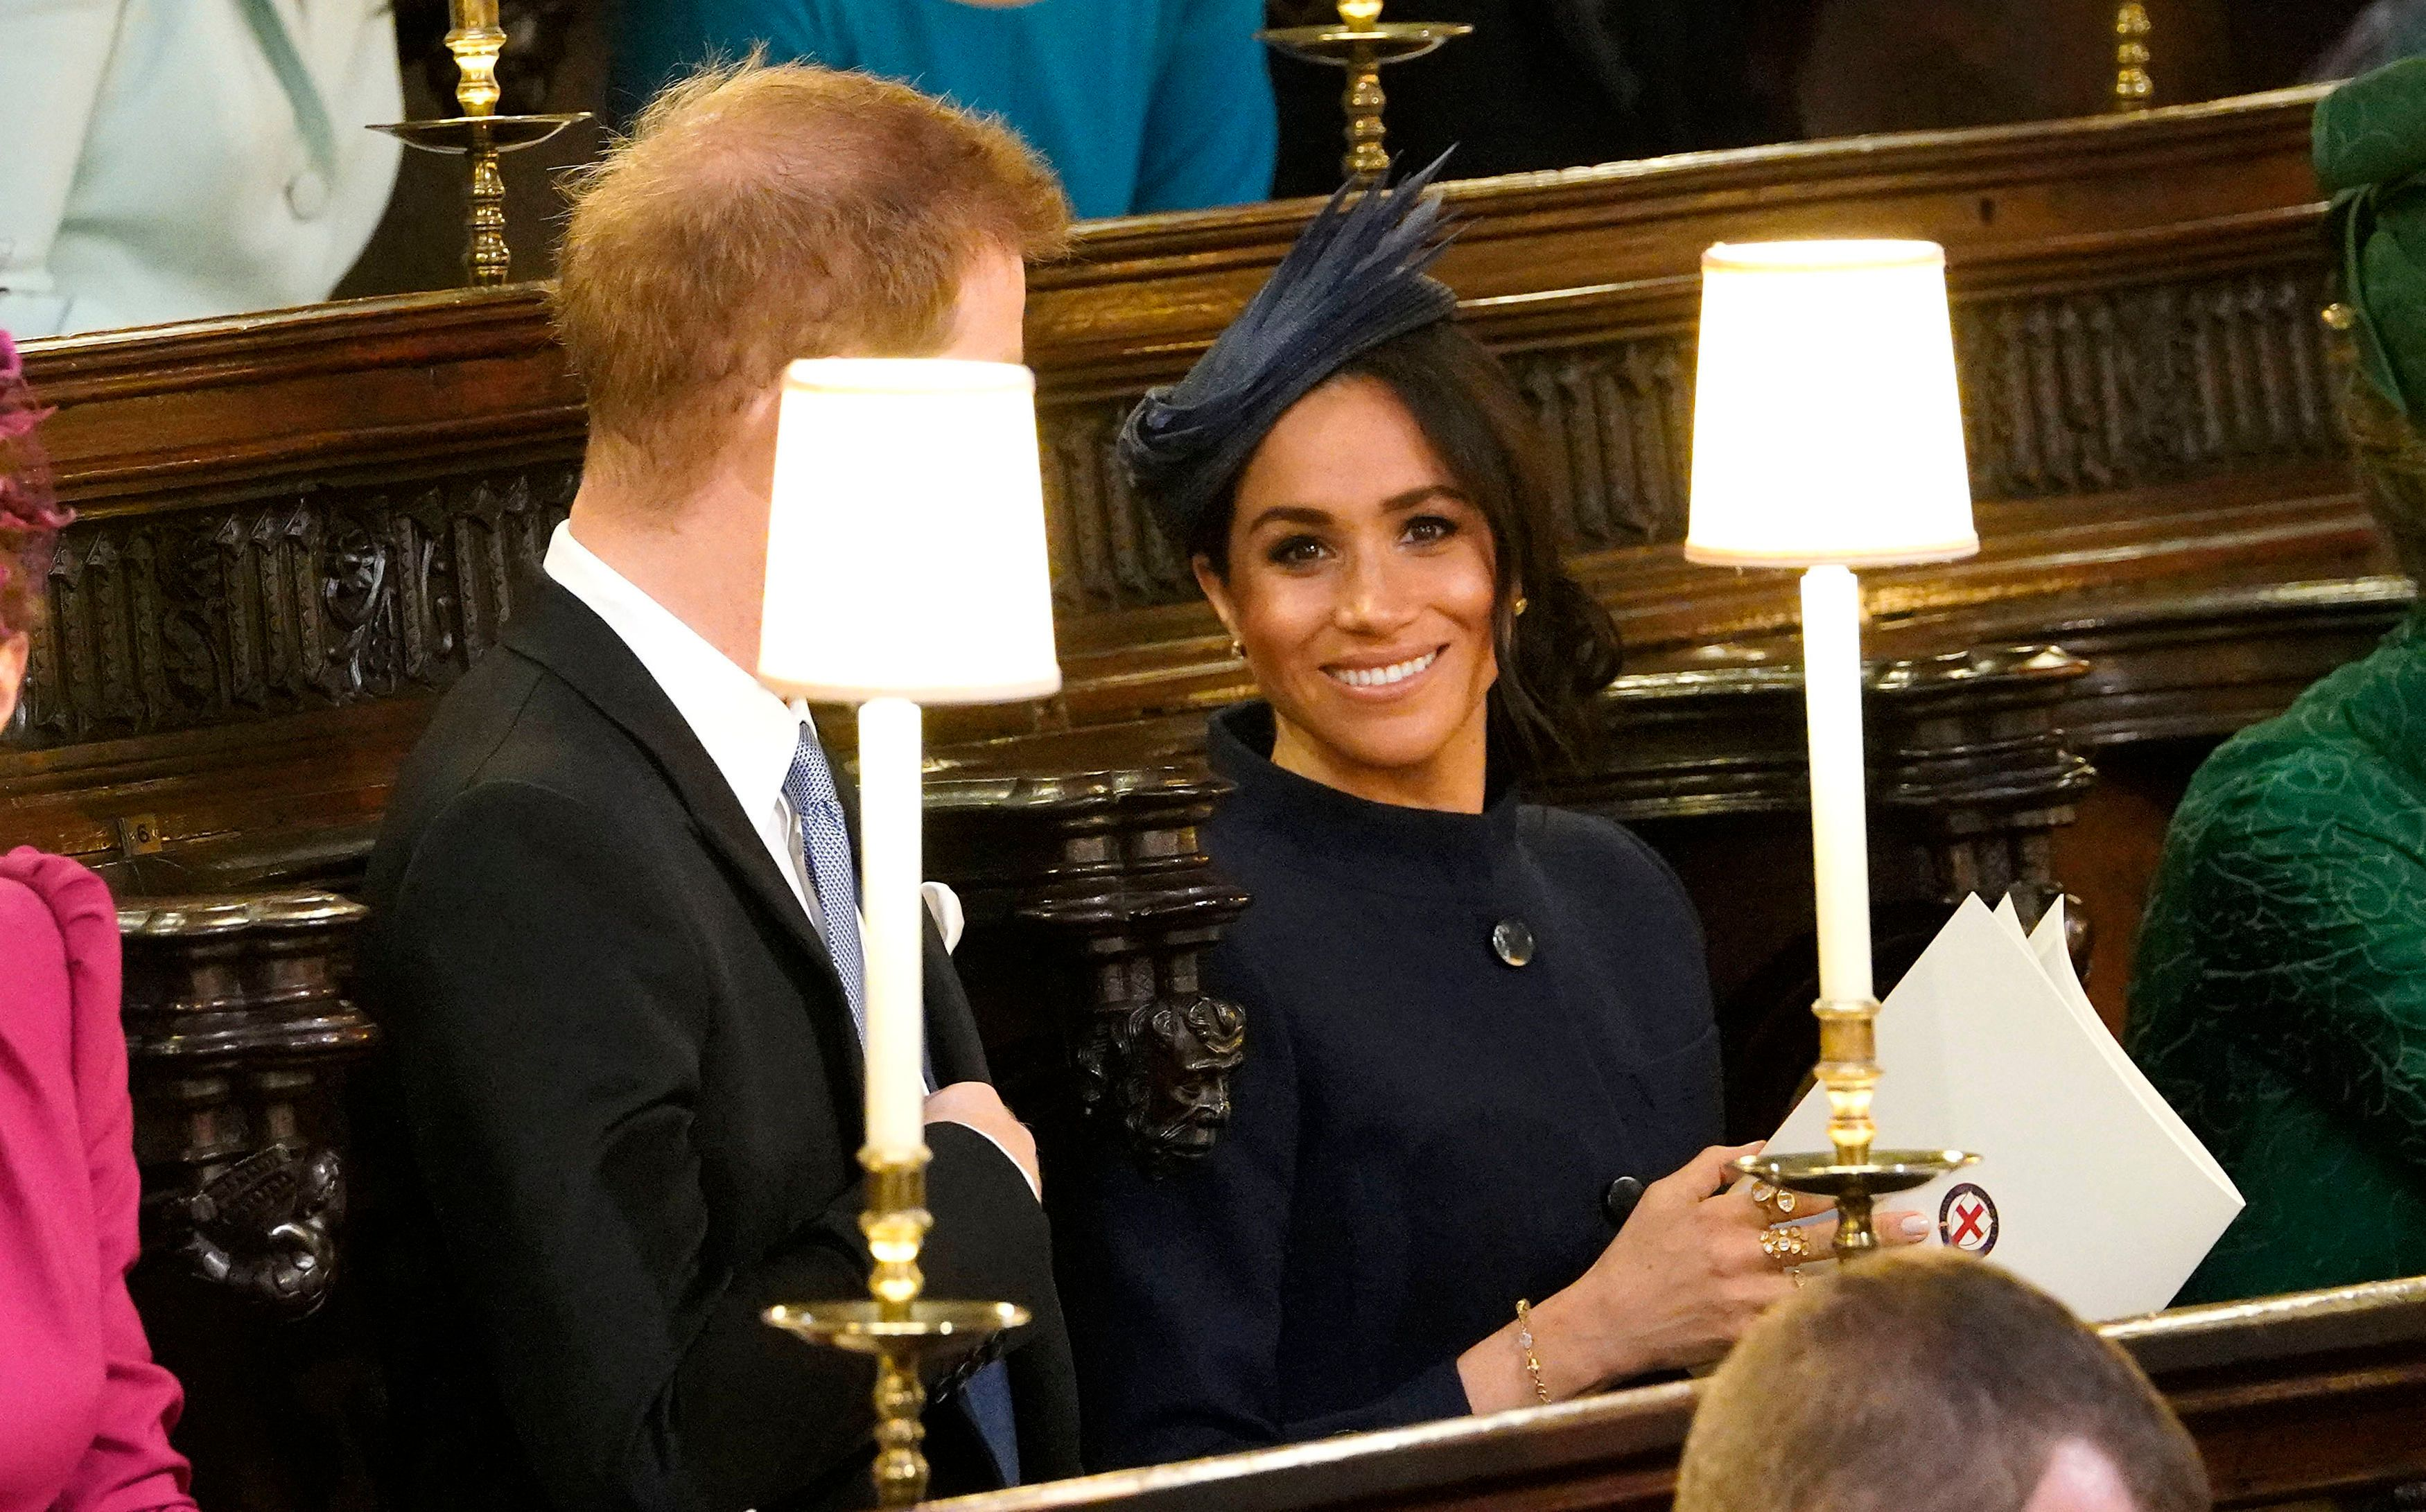 Meghan Markle Stuns In Givenchy At Princess Eugenie's Royal Wedding